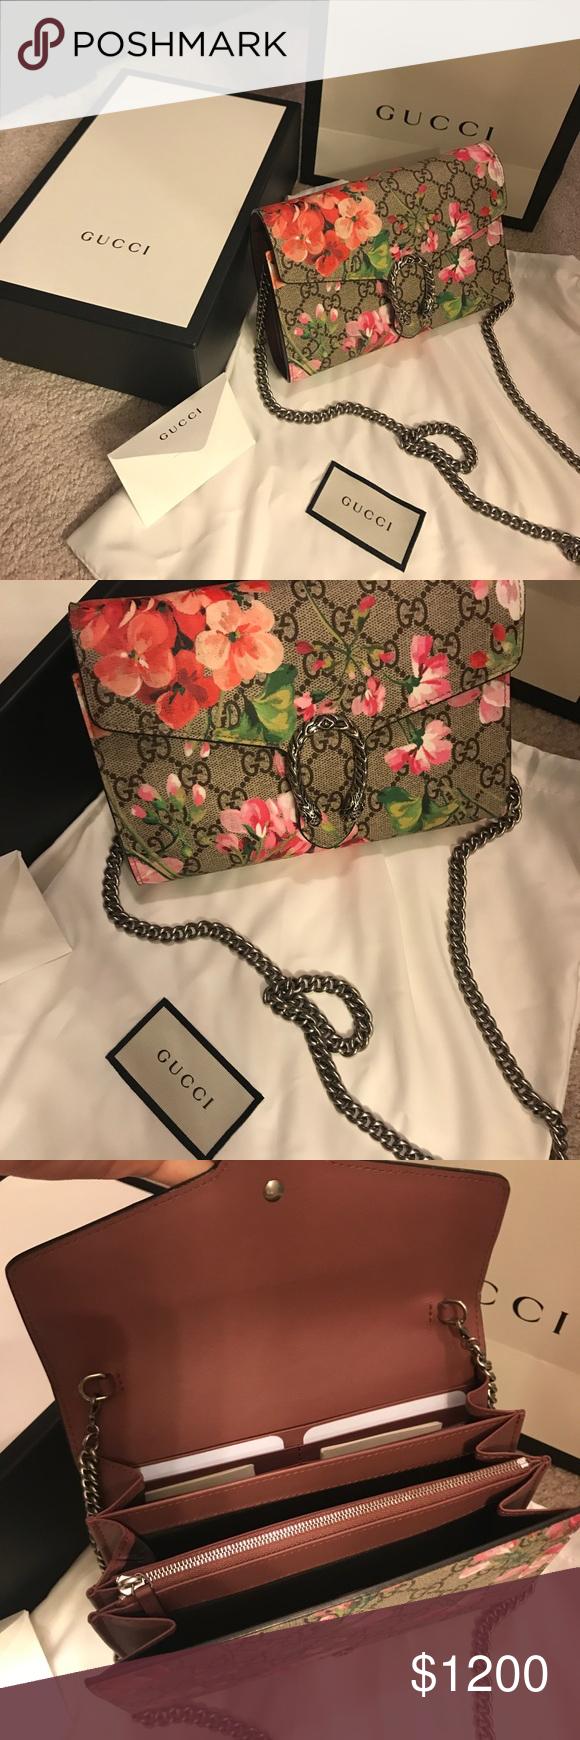 b49f9d8aee60 Gucci Dionysus Blooms mini chain bag 100% Authentic Gucci Dionysus Blooms  print mini chain bag